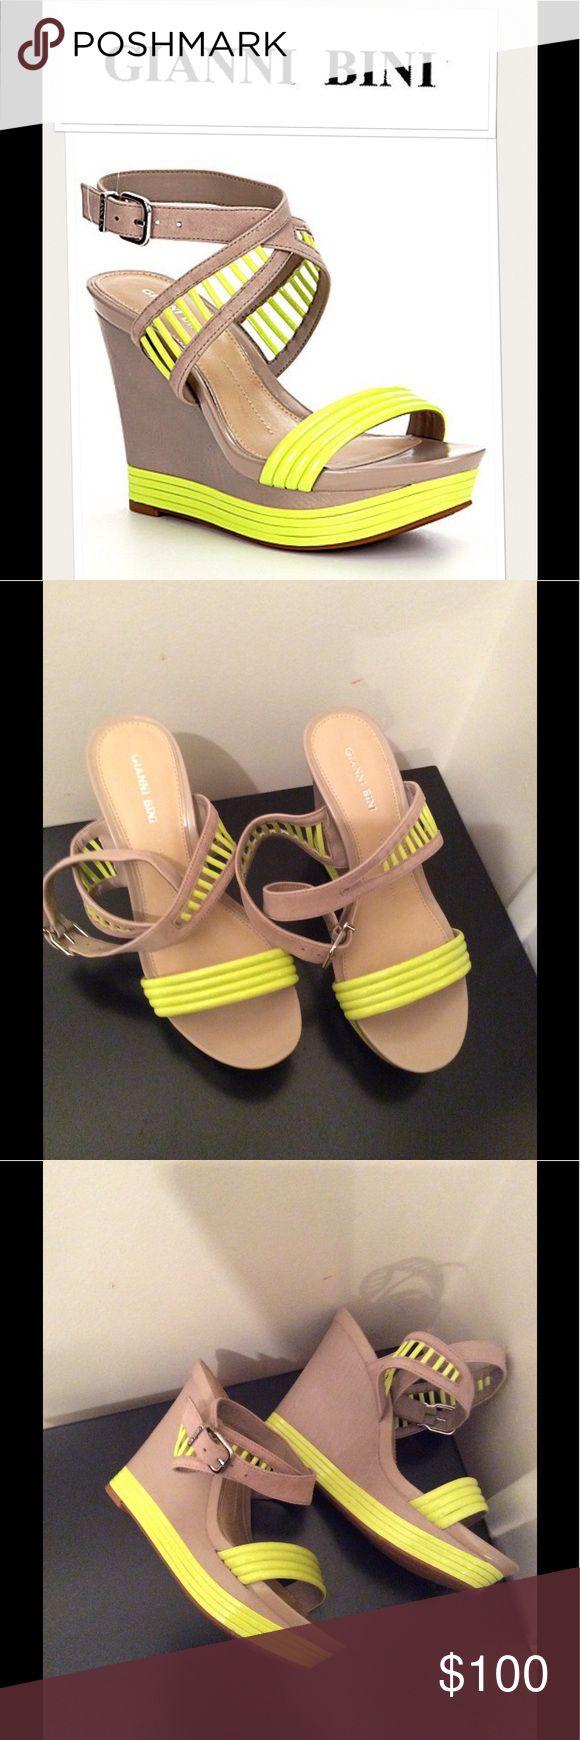 "NEW Gianni Bini ""Barb"" sandals 0725 NEW Gianni Bini ""Barb"" sandal. Gianni Bini Shoes Wedges"